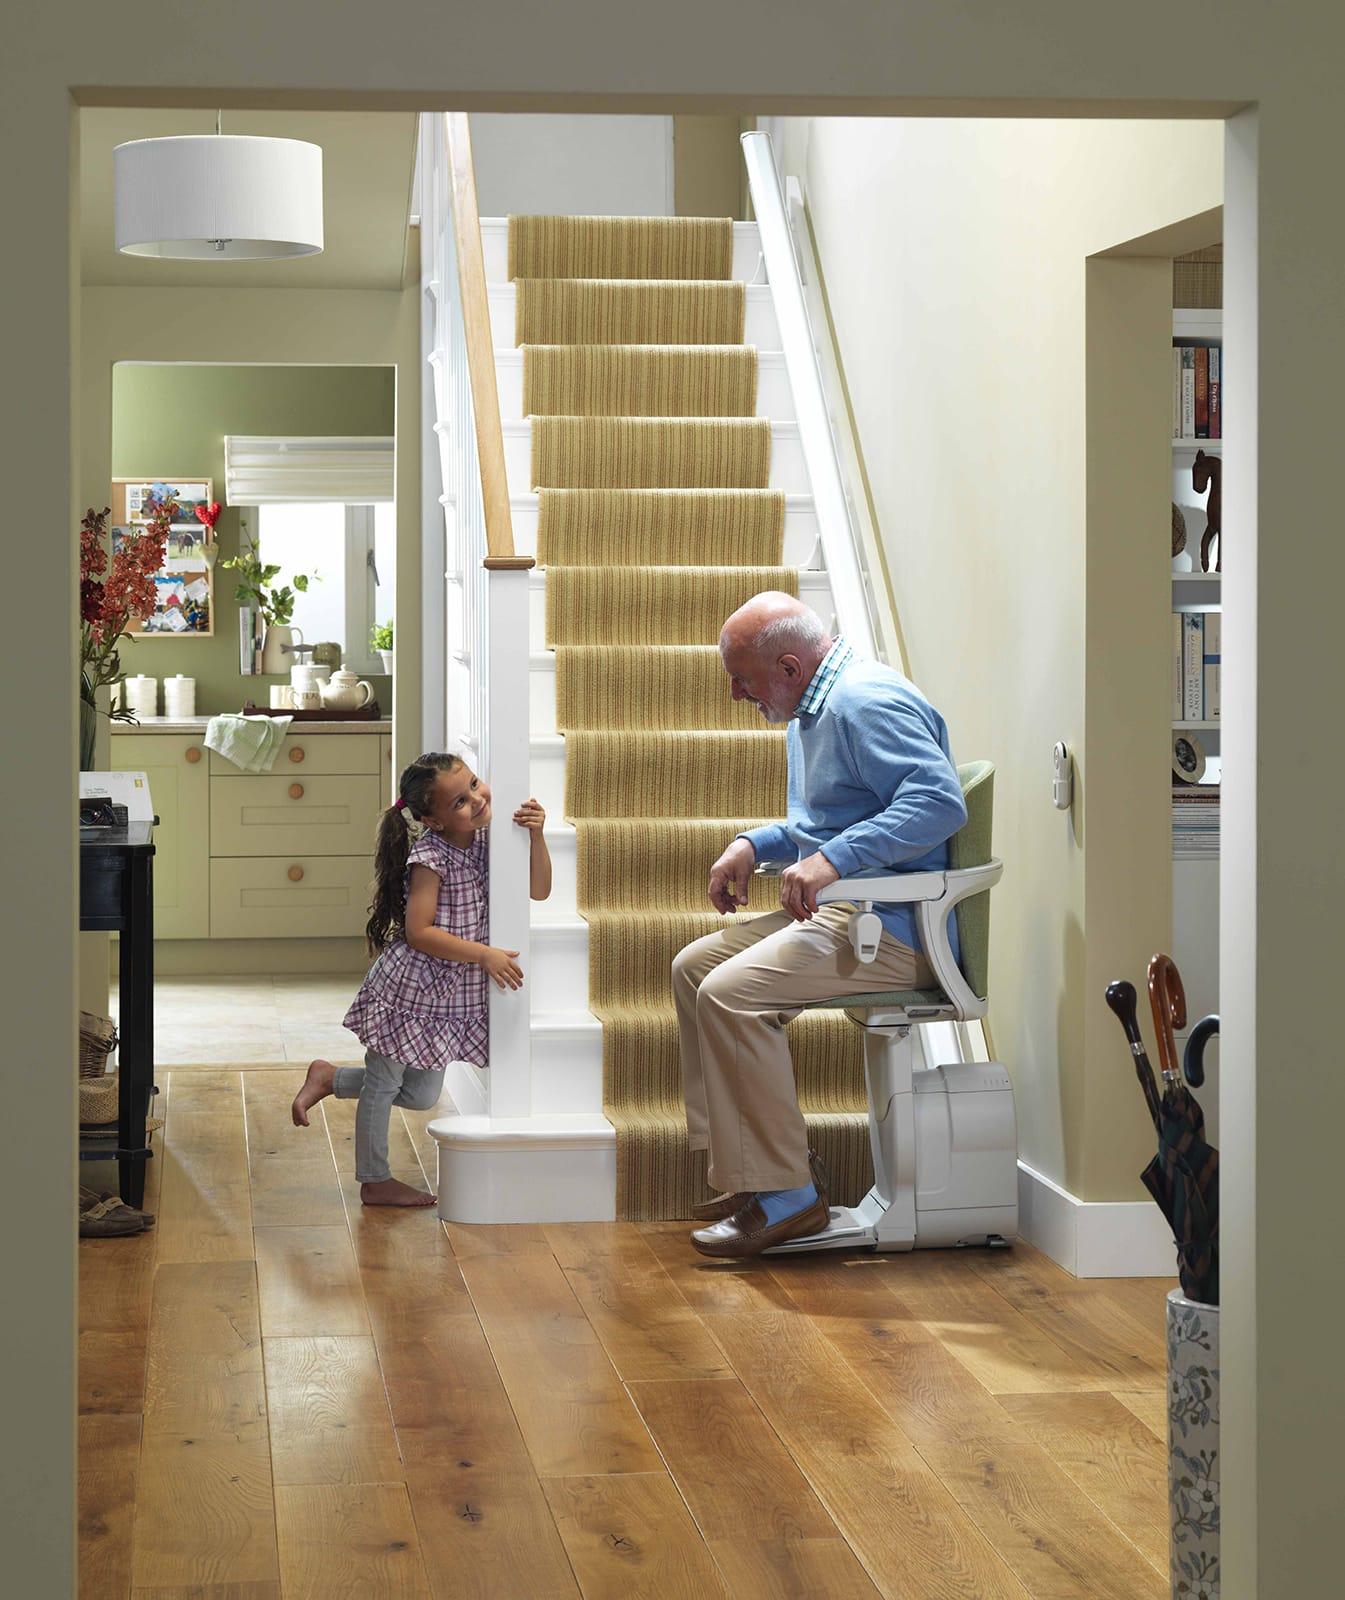 Montascale Per Disabili E Anziani